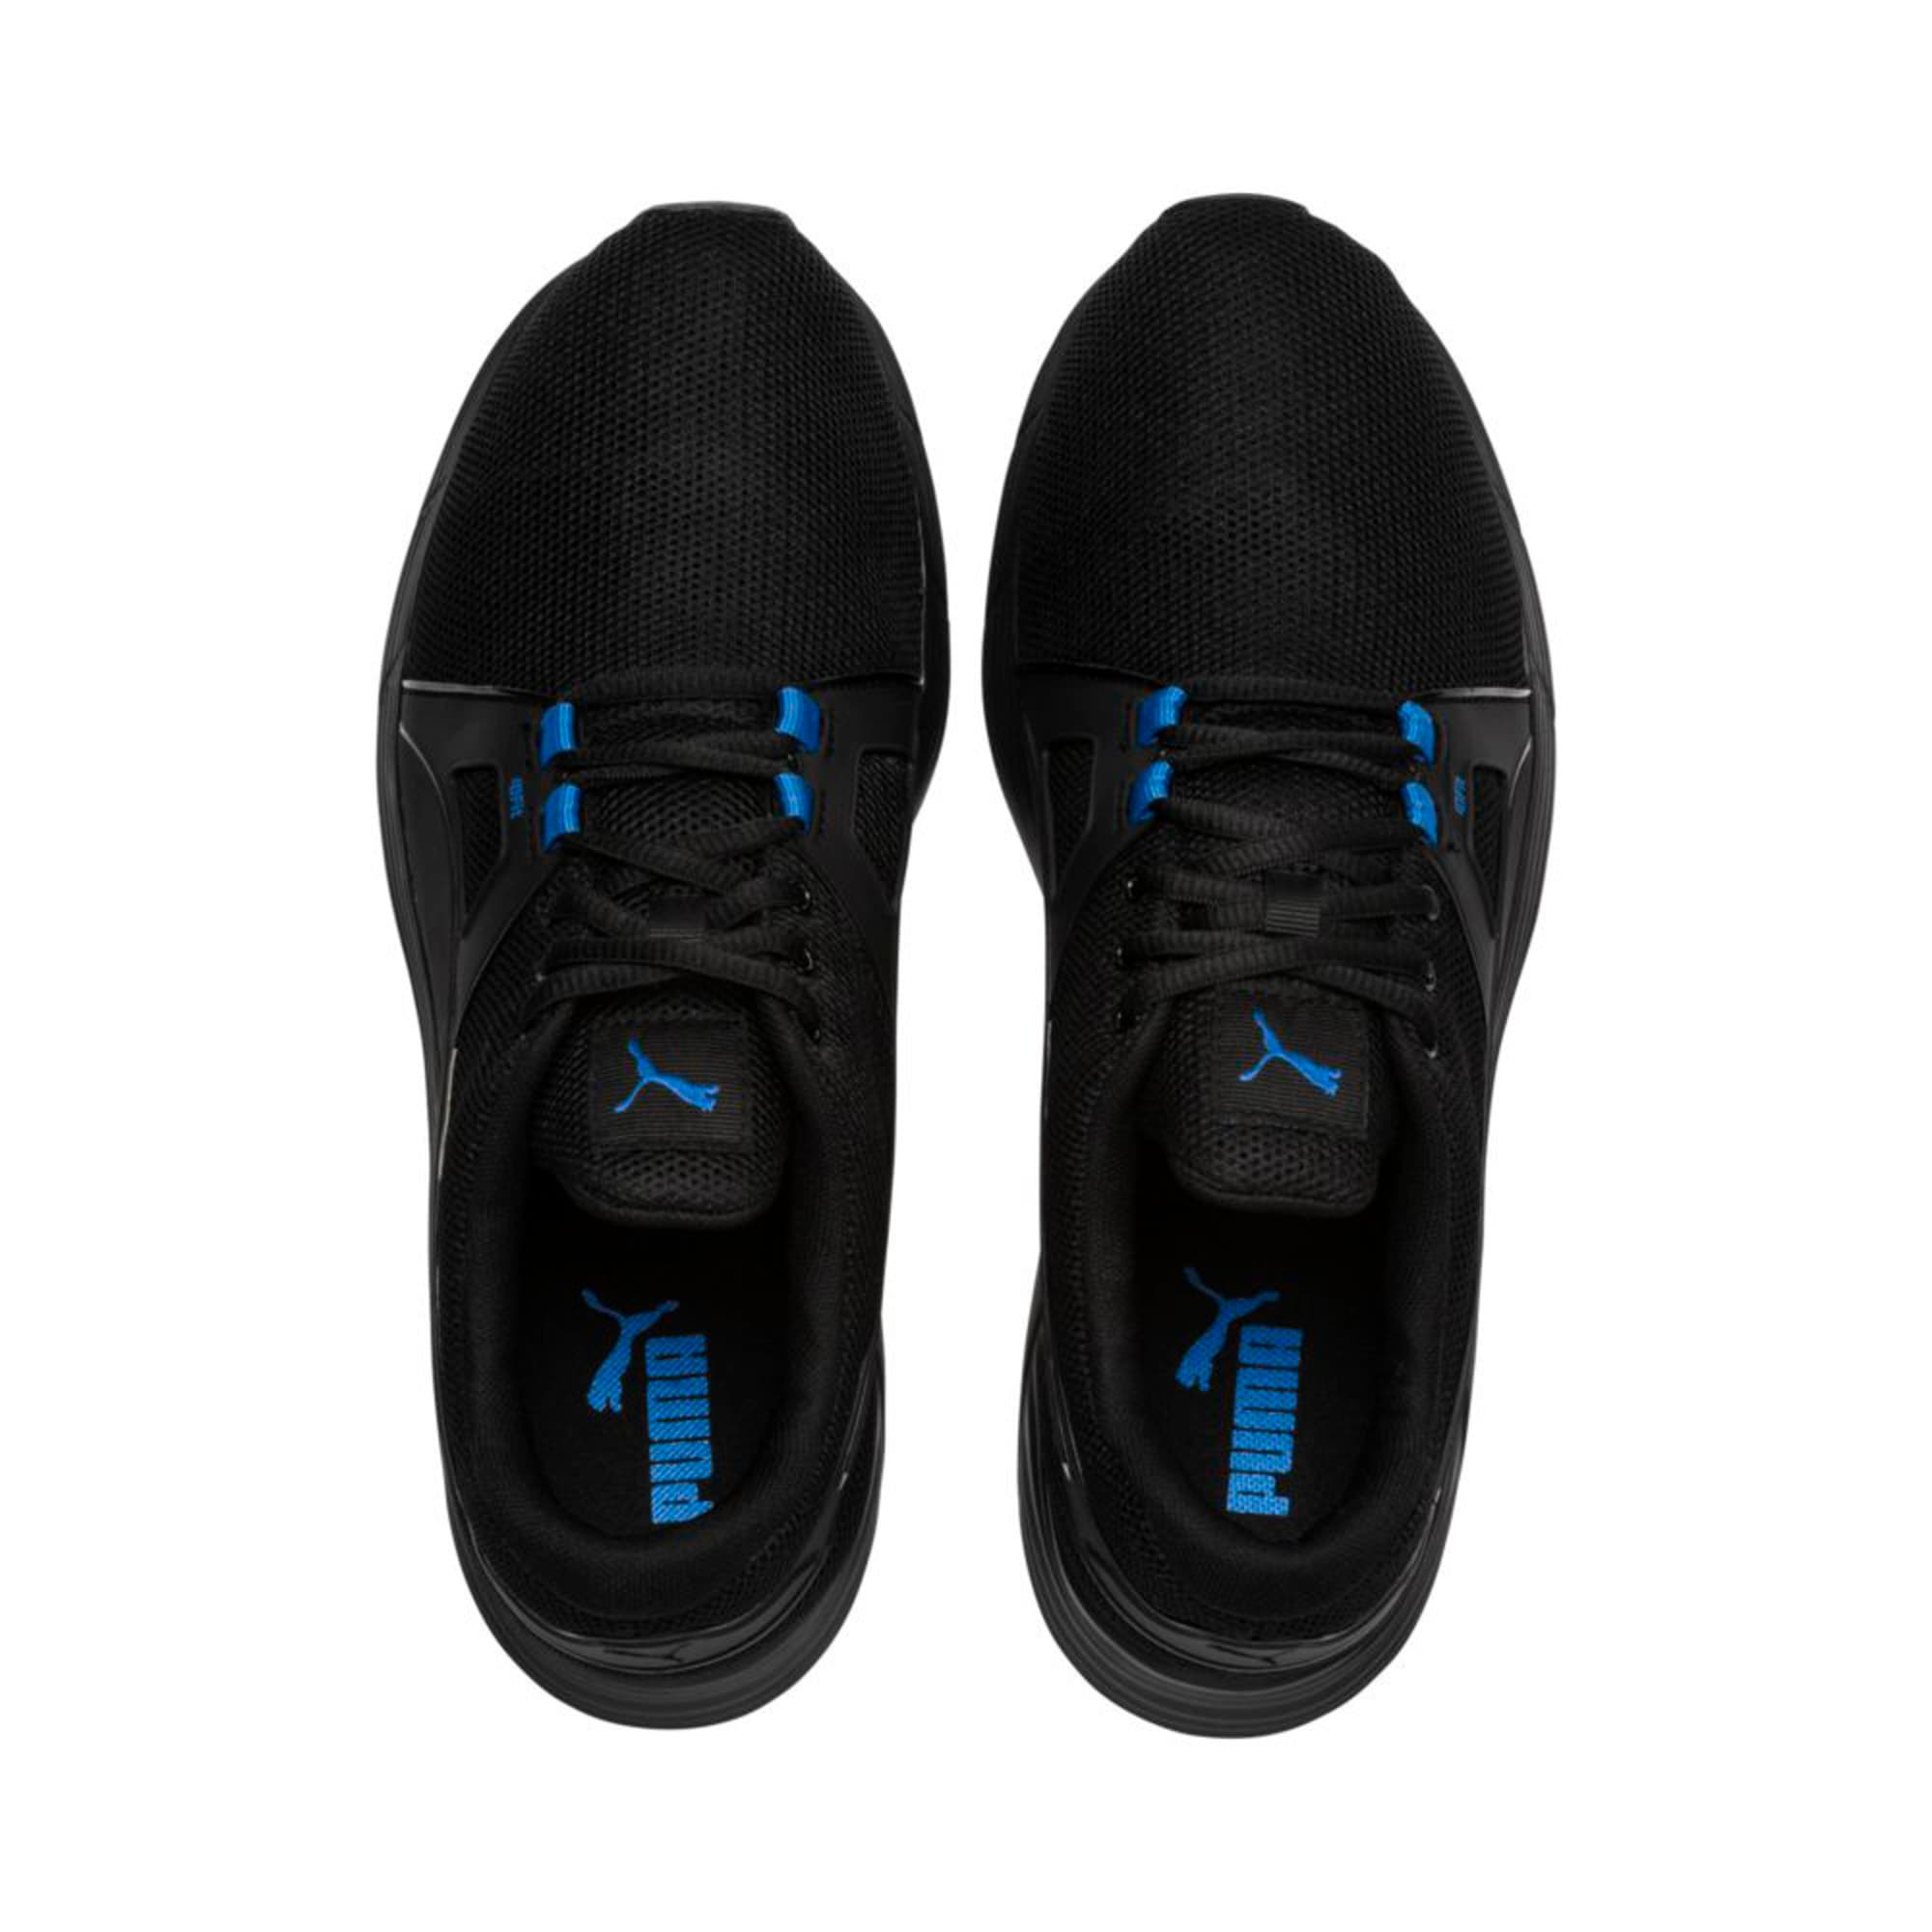 Thumbnail 3 of Propel XT Men's Training Shoes, Puma Black-Strong Blue, medium-IND